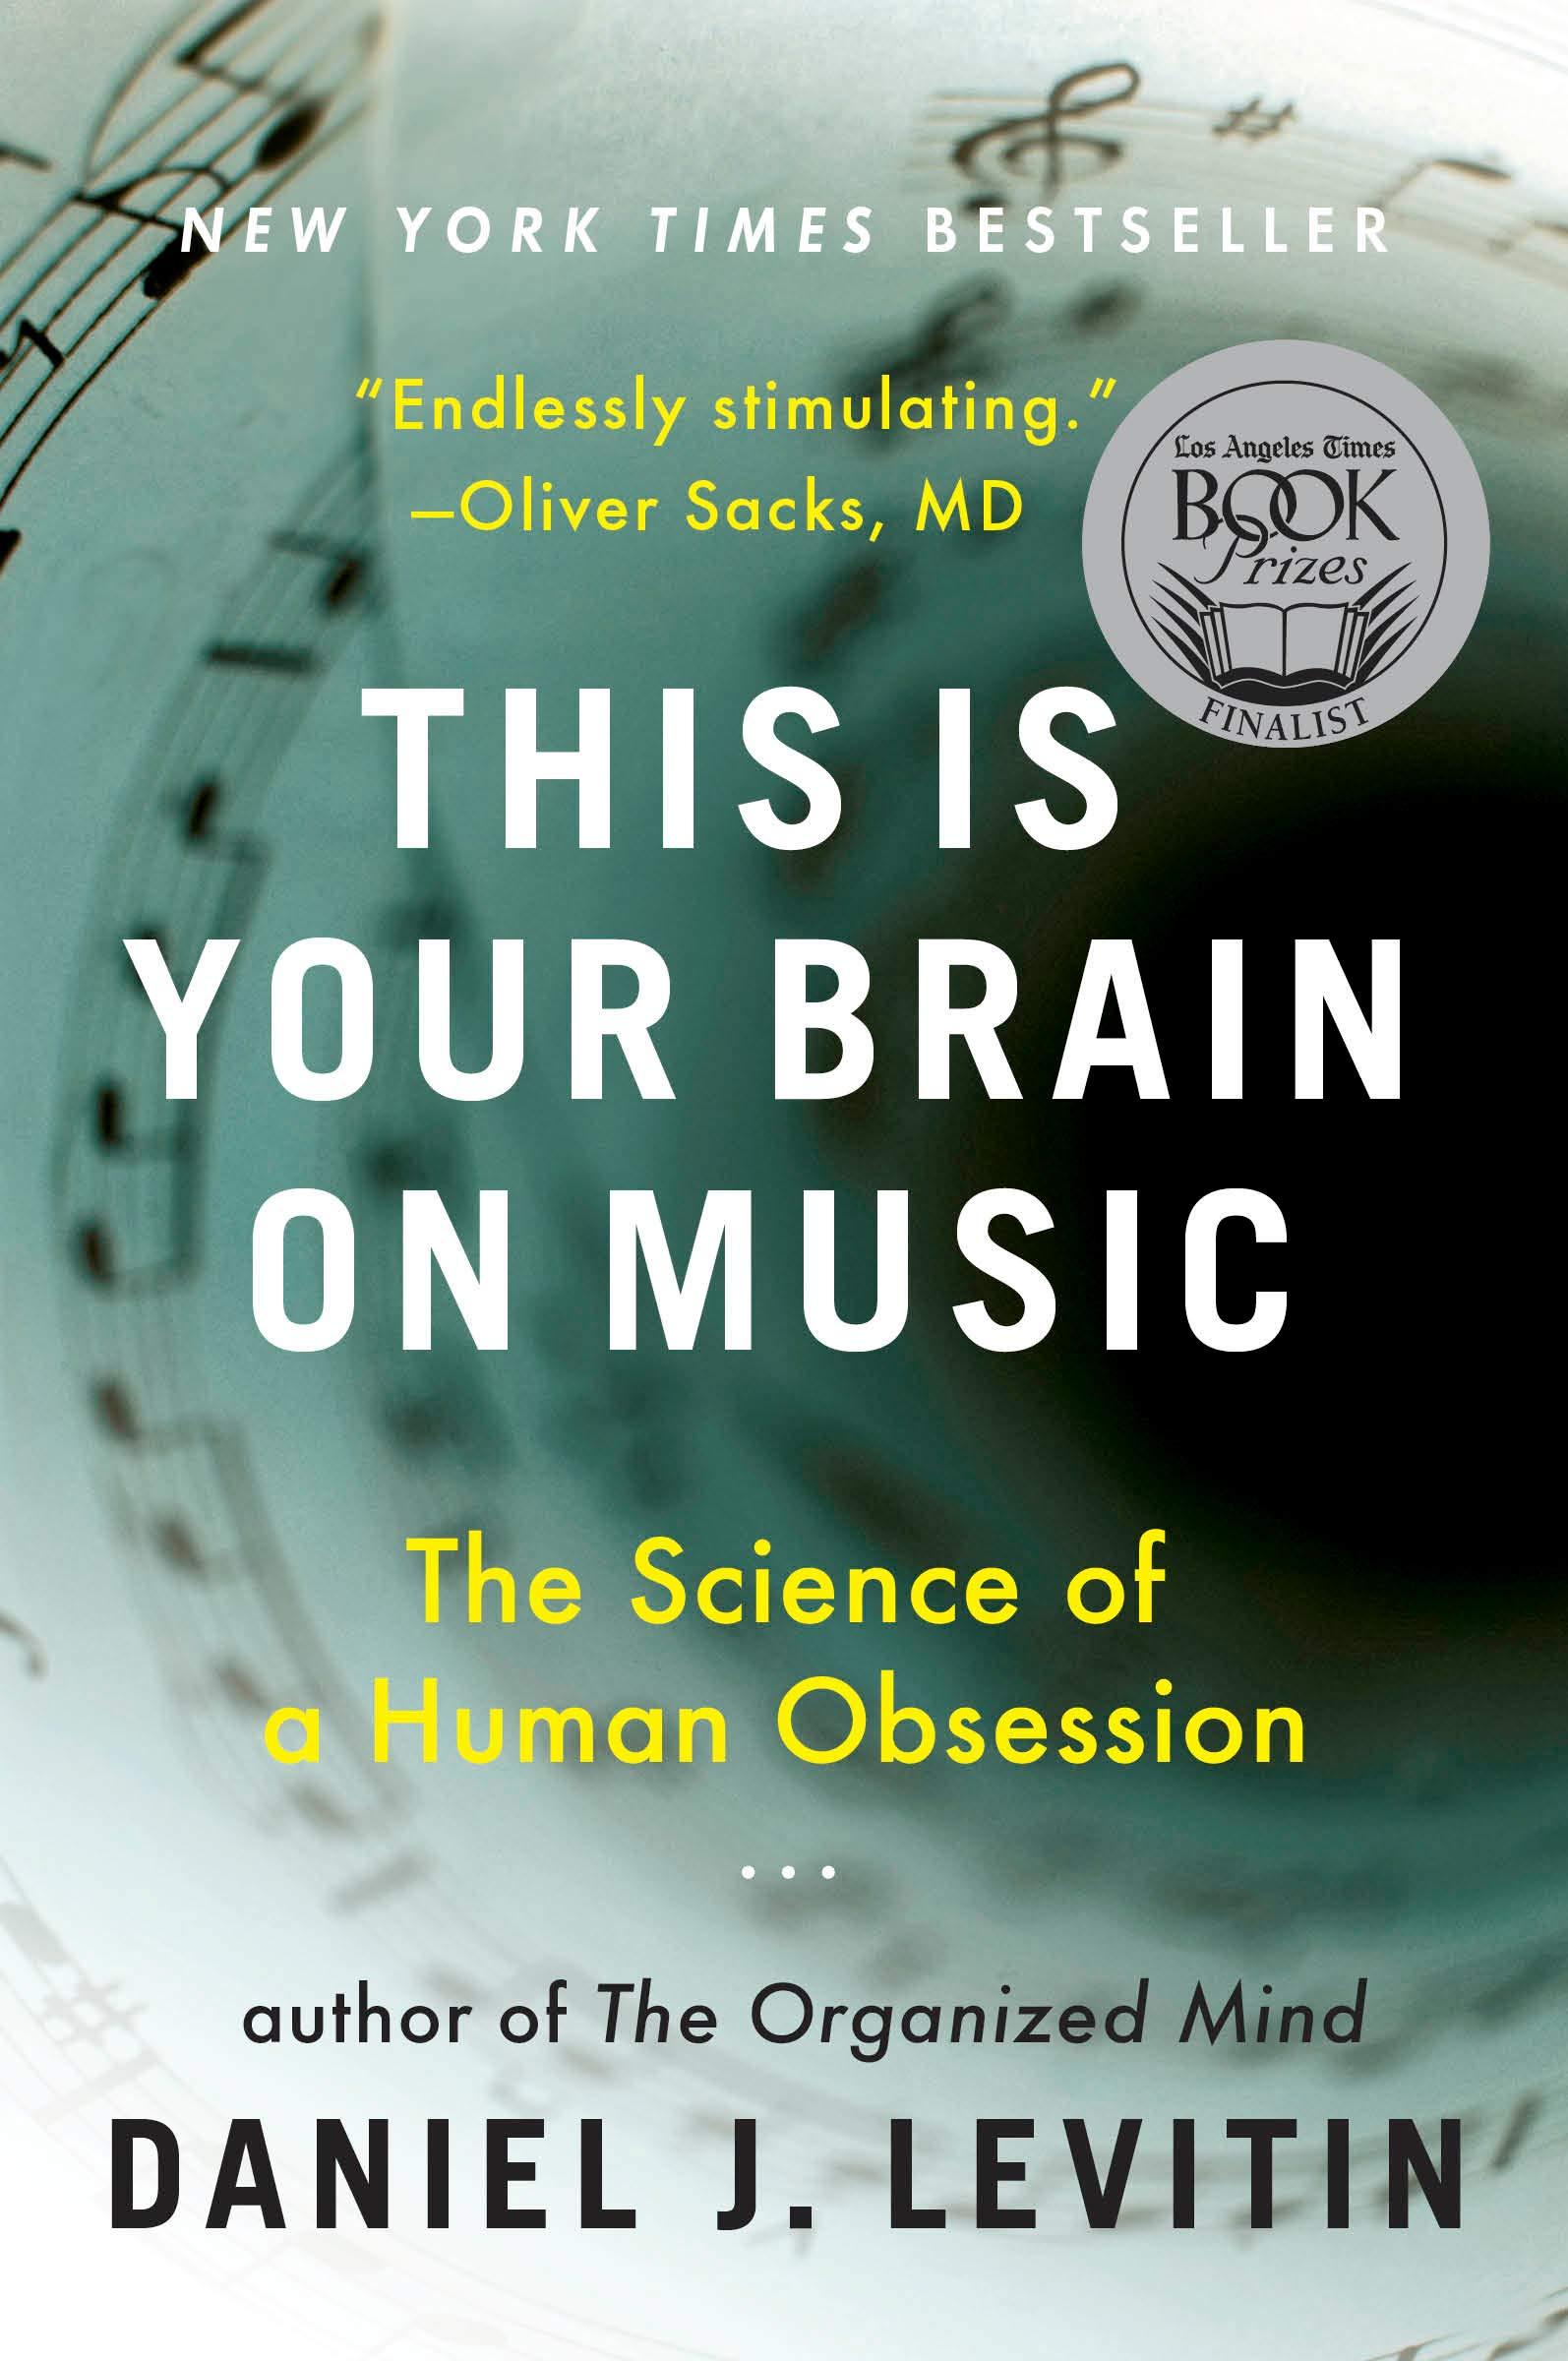 brain on music.jpg